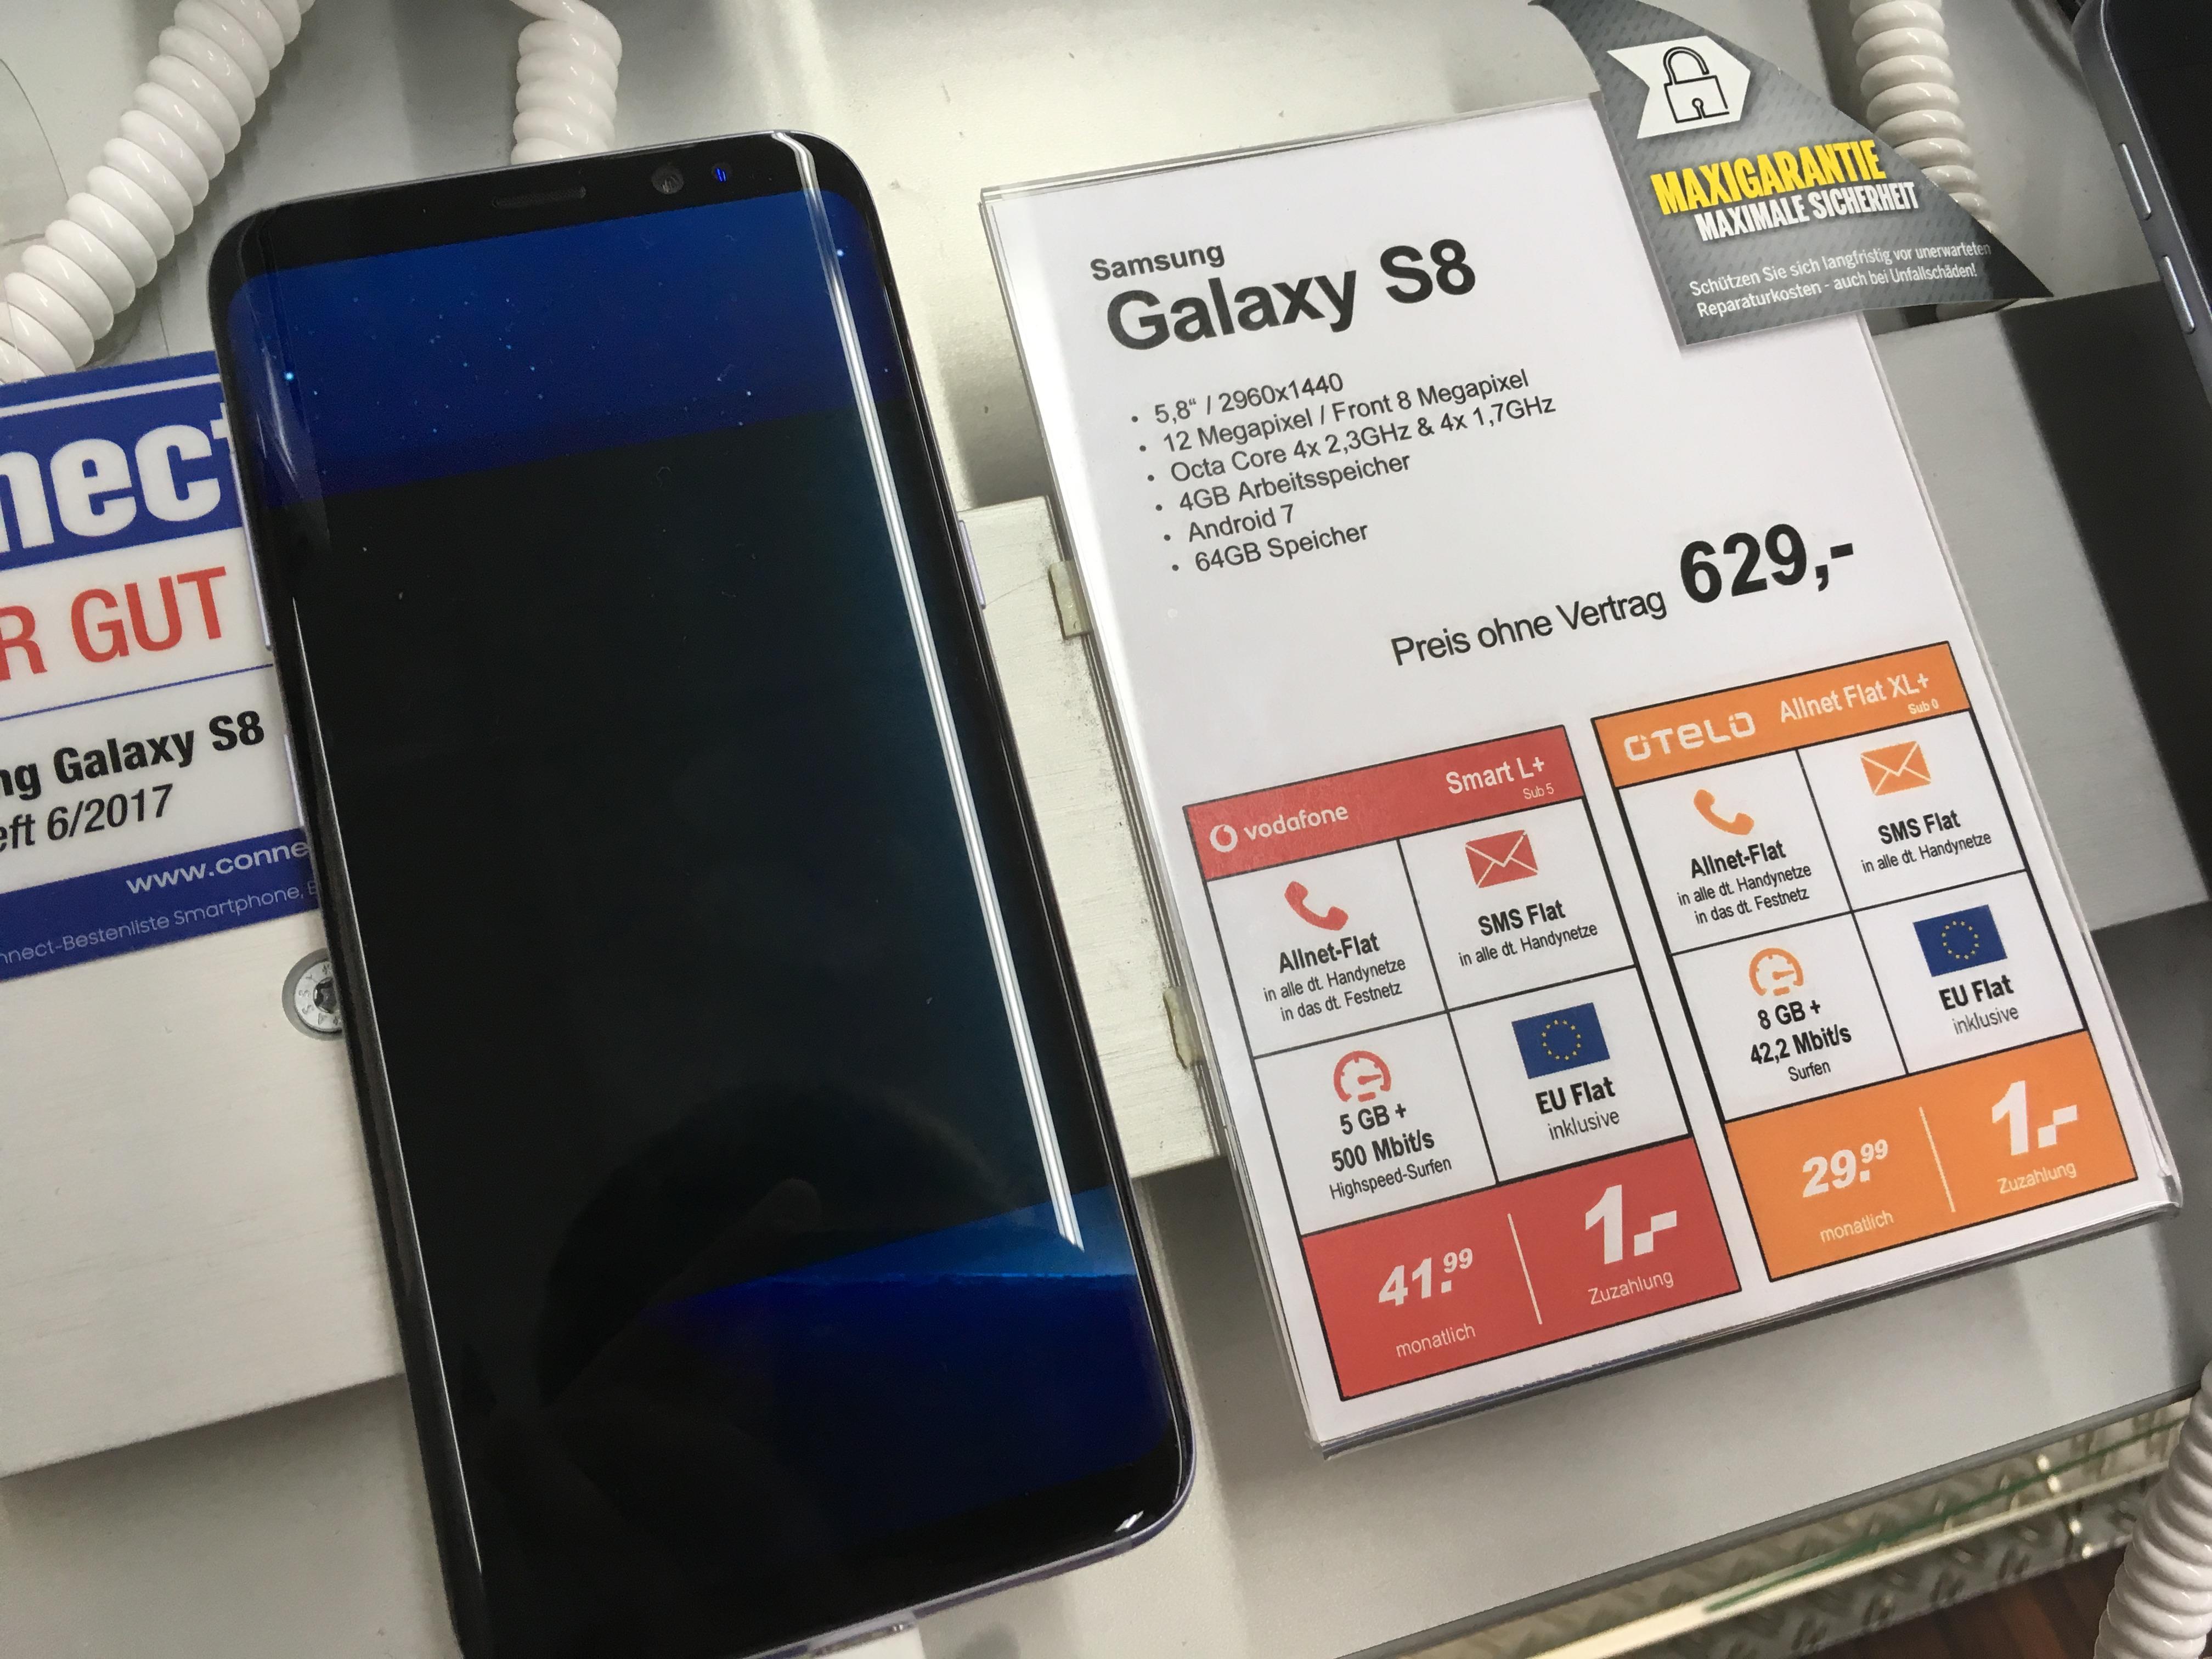 [Lokal Hildesheim] MEDIMAX // Samsung Galaxy S8 // OTELO Allnet XL+ 8GB Datenvolumen // 29,99€ mtl.